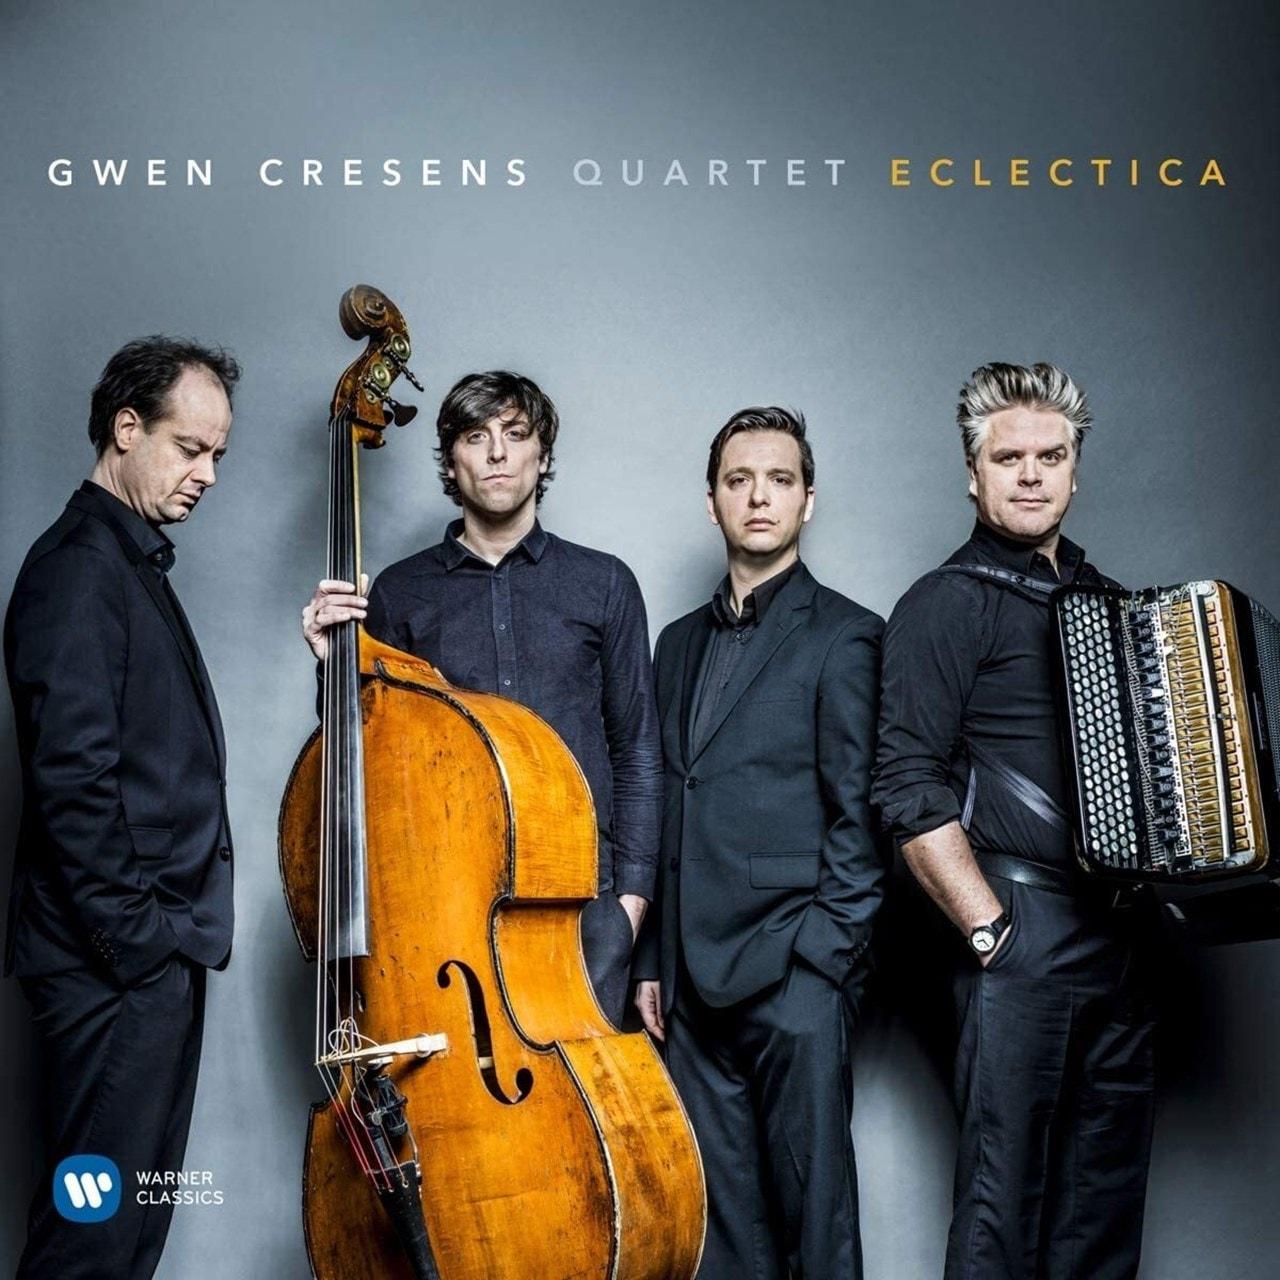 Gwen Cresens Quartet: Eclectica - 1